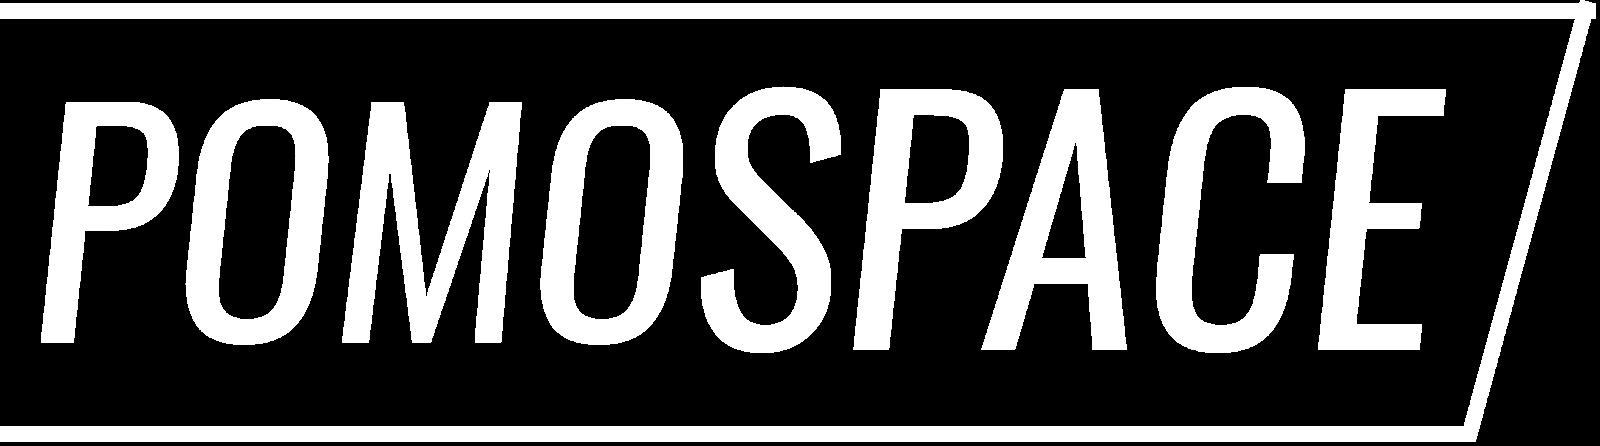 POMOSPACE